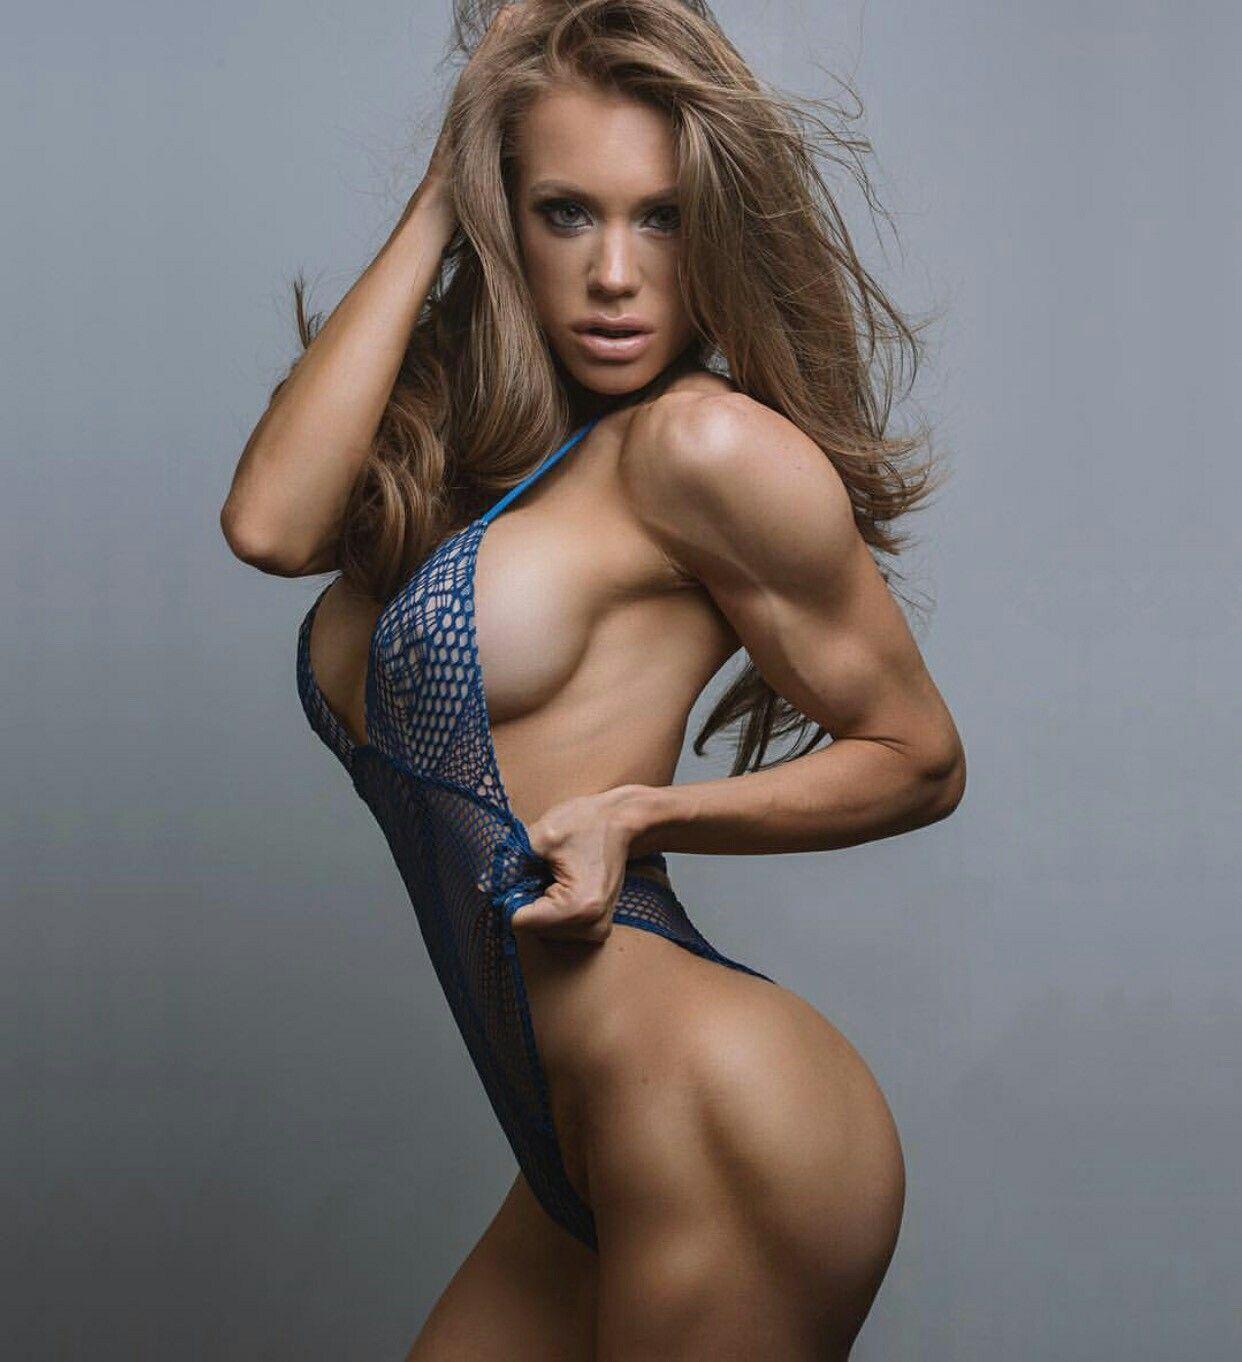 Selfie Samantha Skolkin naked (66 photo), Boobs